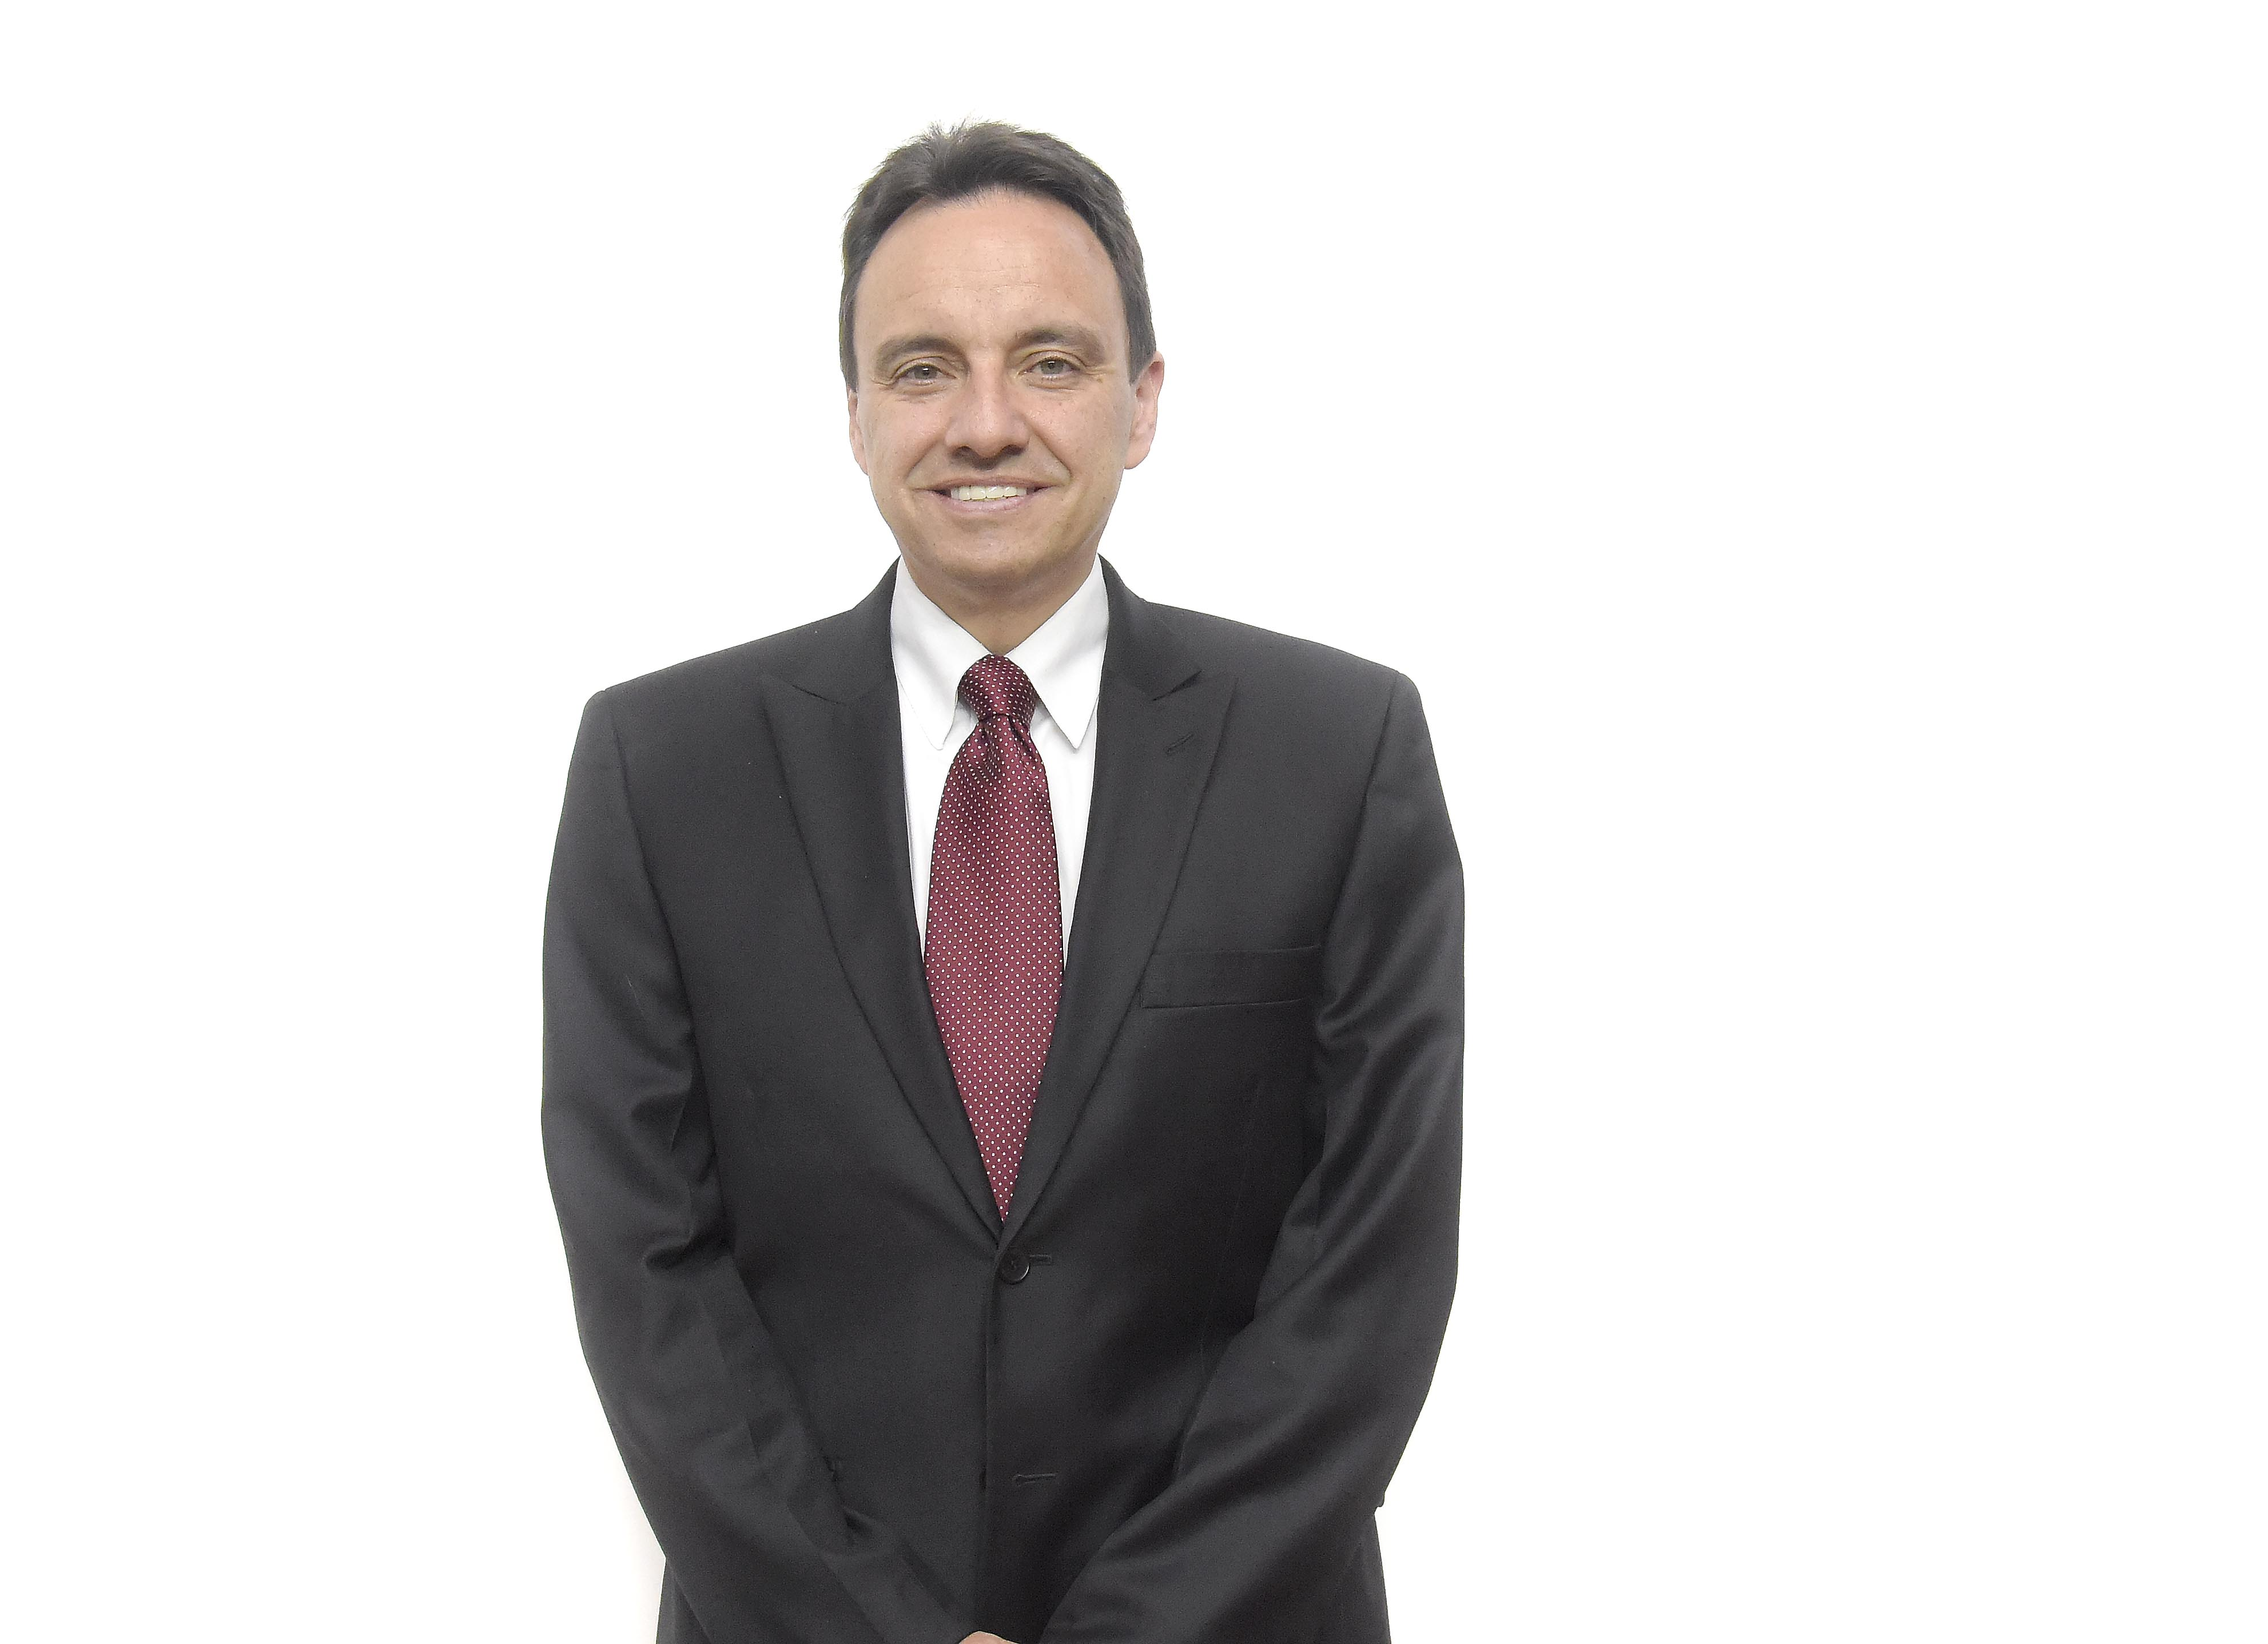 Gonzalo Eduardo Carreño Padilla